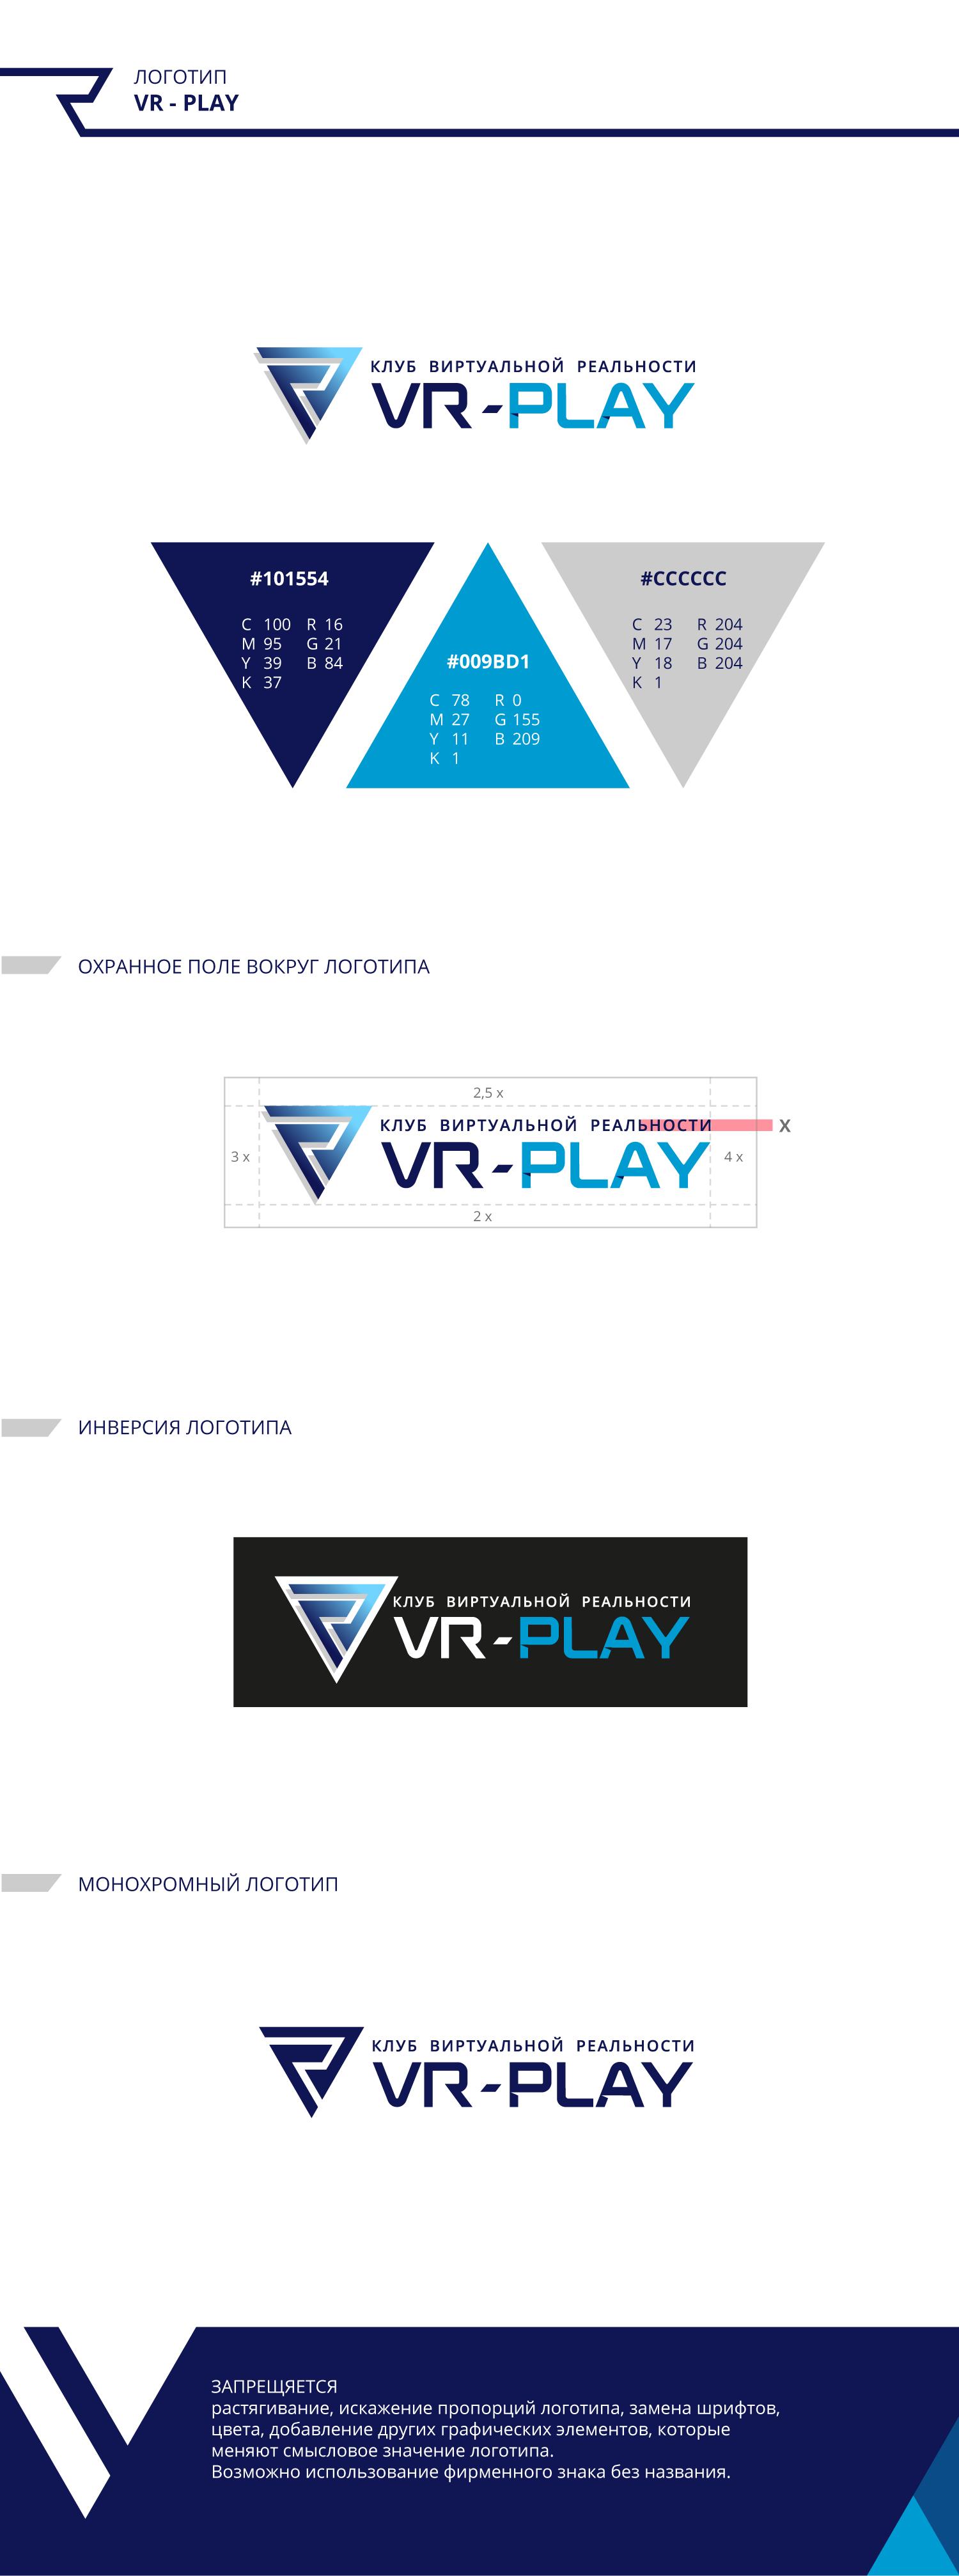 VR-Play – клуб виртуальной реальности